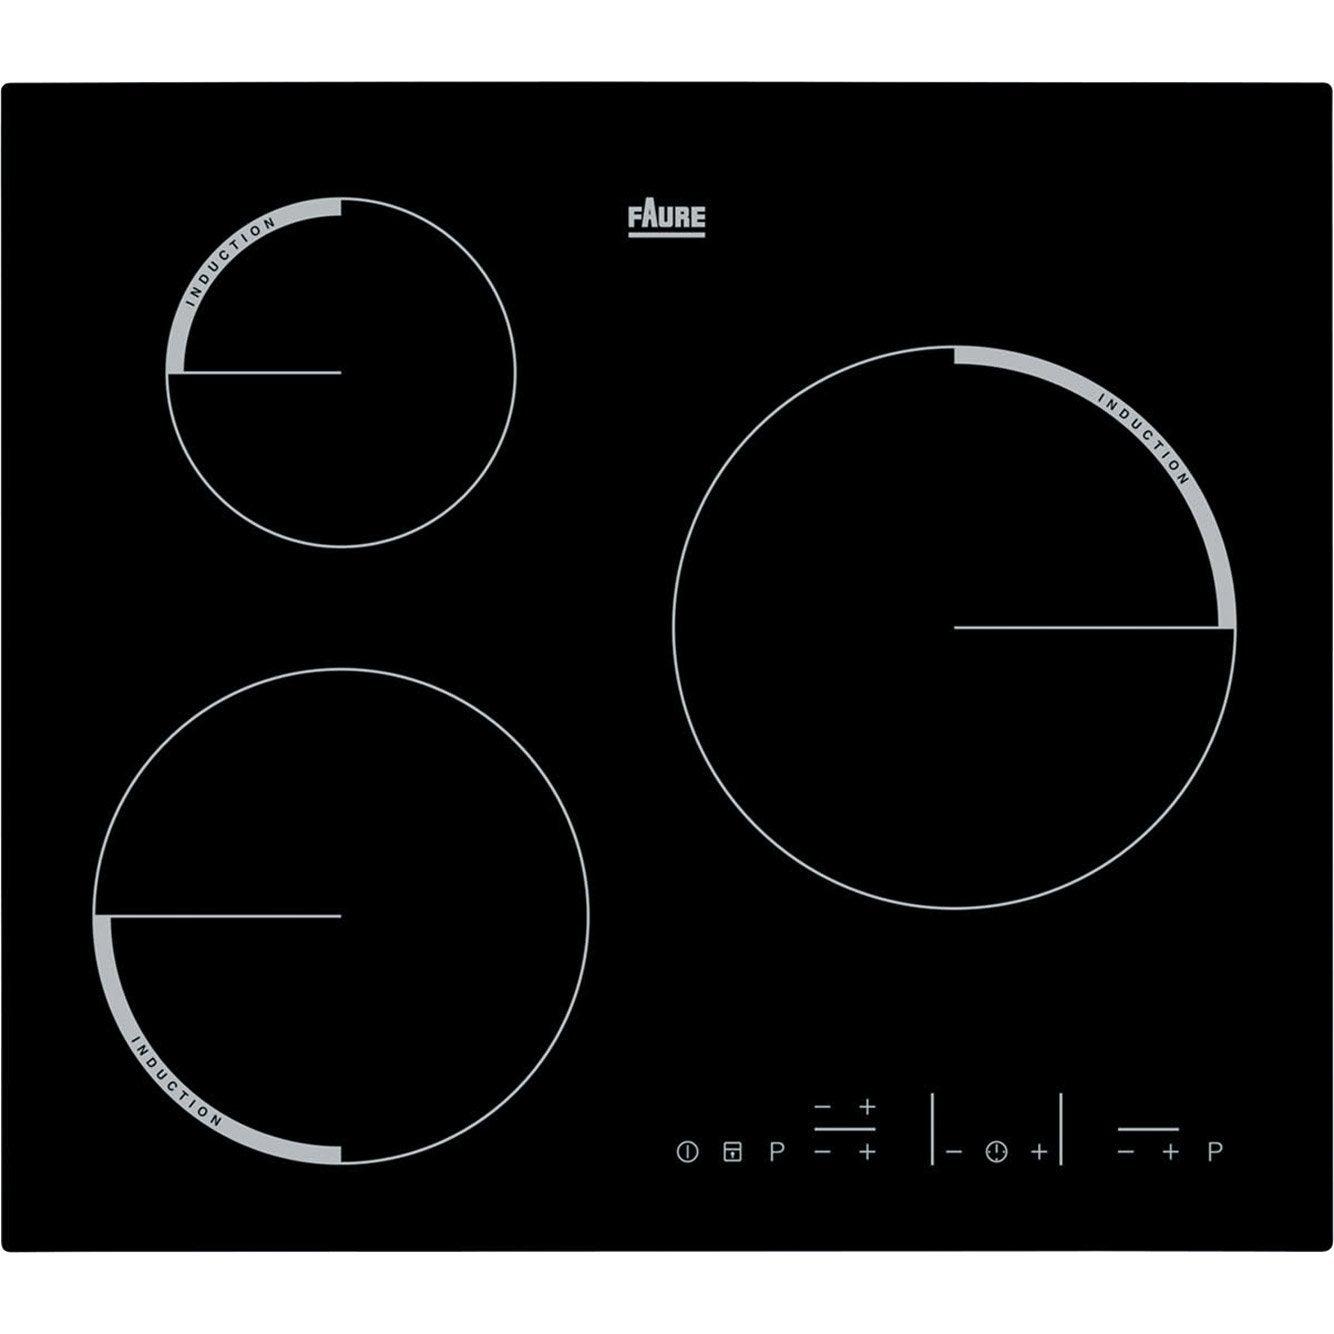 Plaque à Induction 3 Foyers Noir Faure Fel6633fba Leroy Merlin